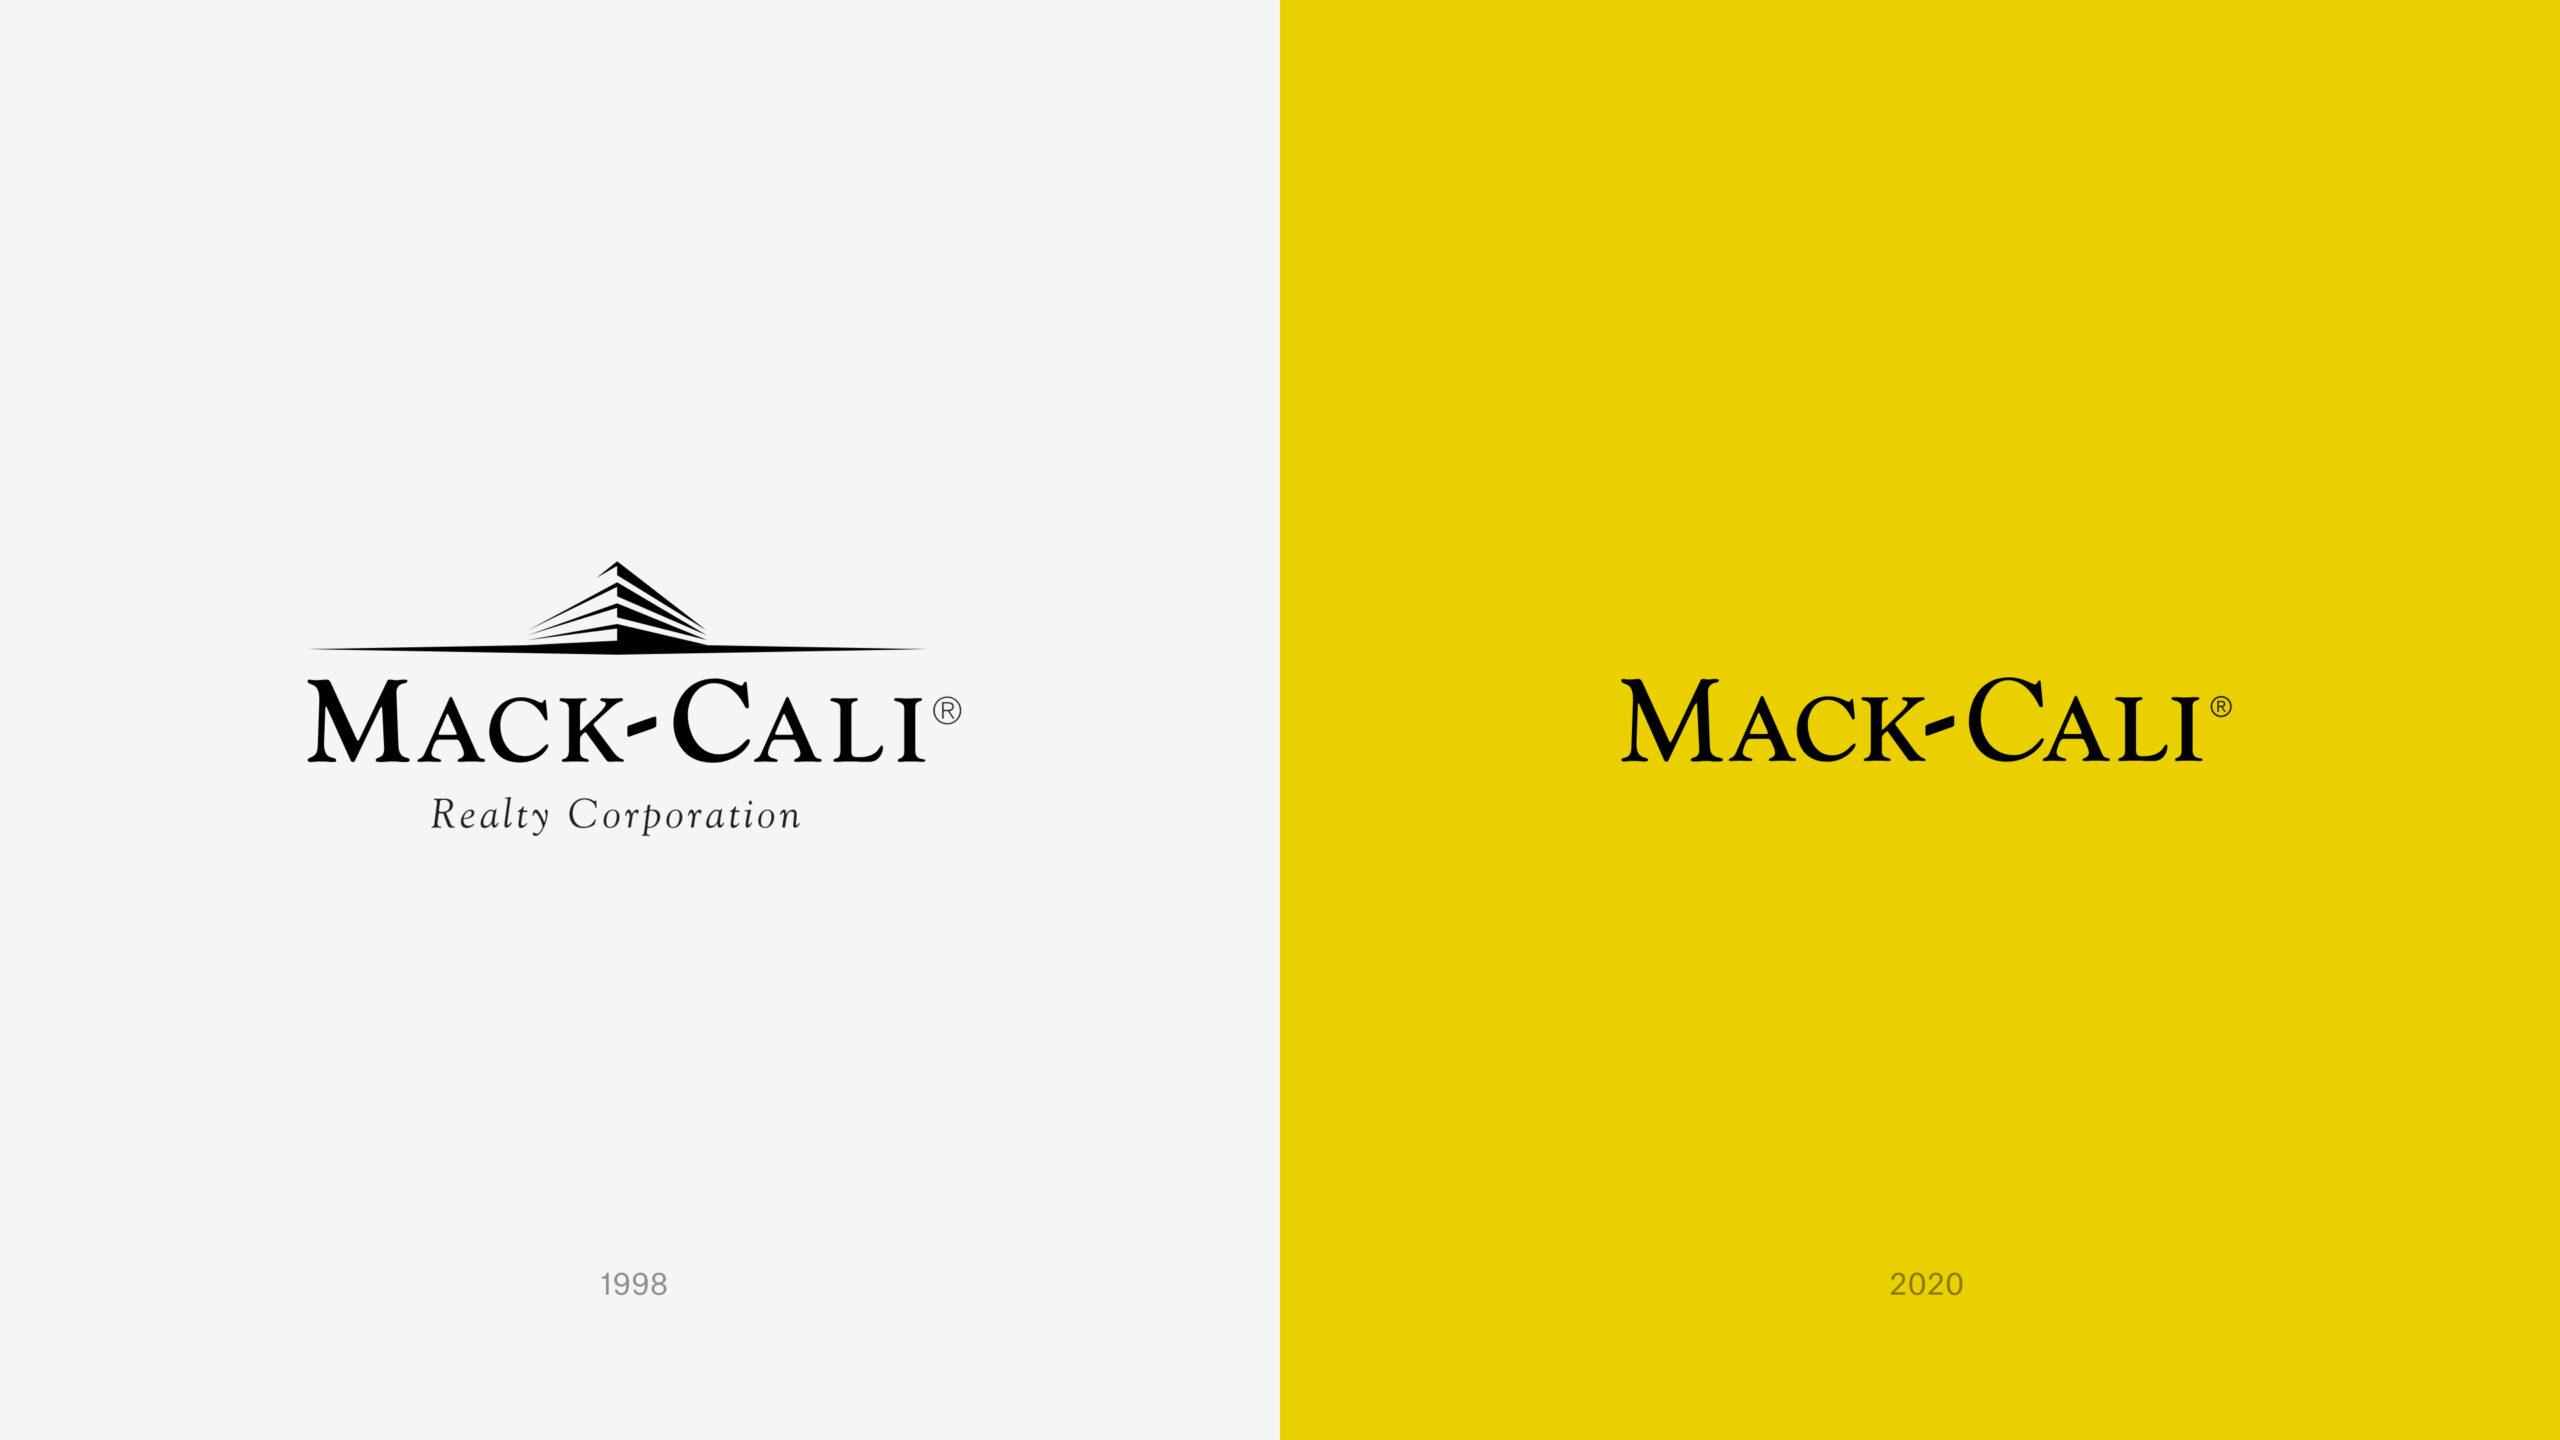 REA_Mack-Cali_Logo